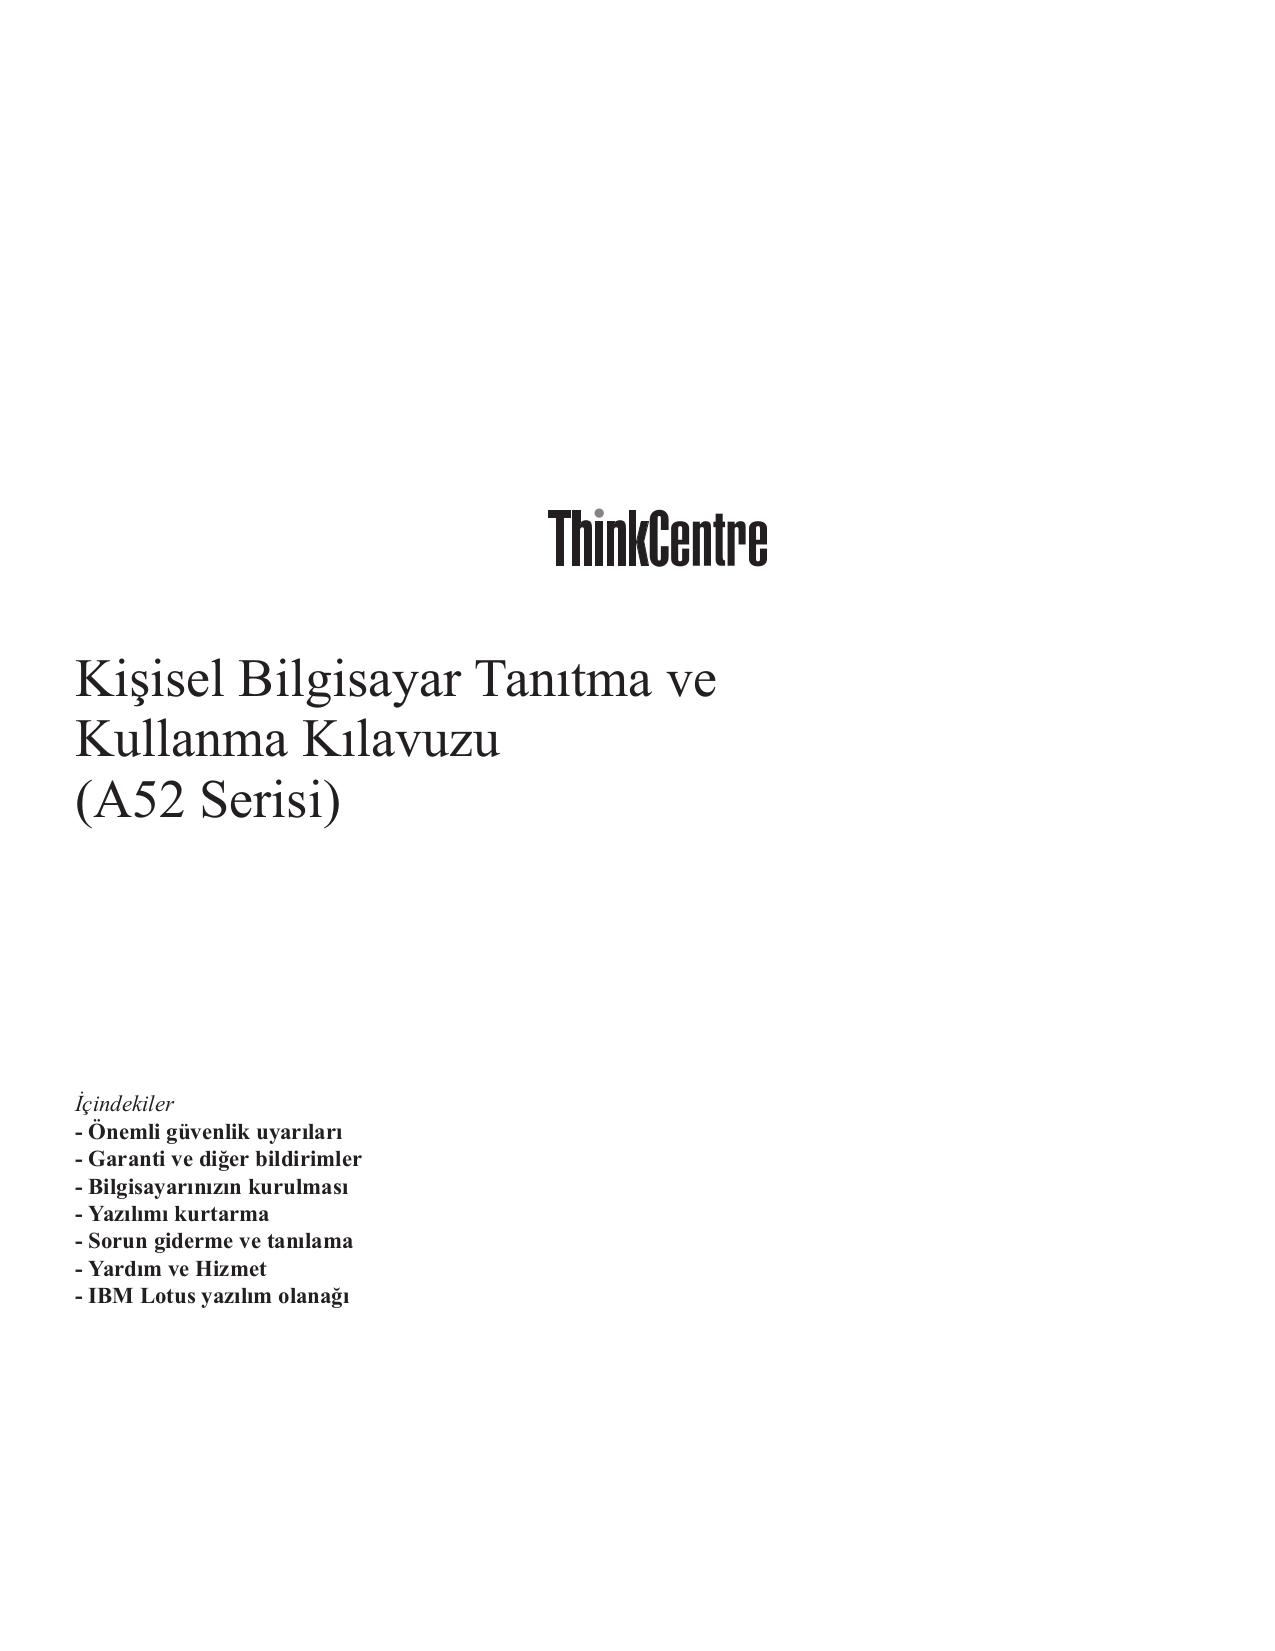 pdf for Lenovo Desktop ThinkCentre A52 8342 manual